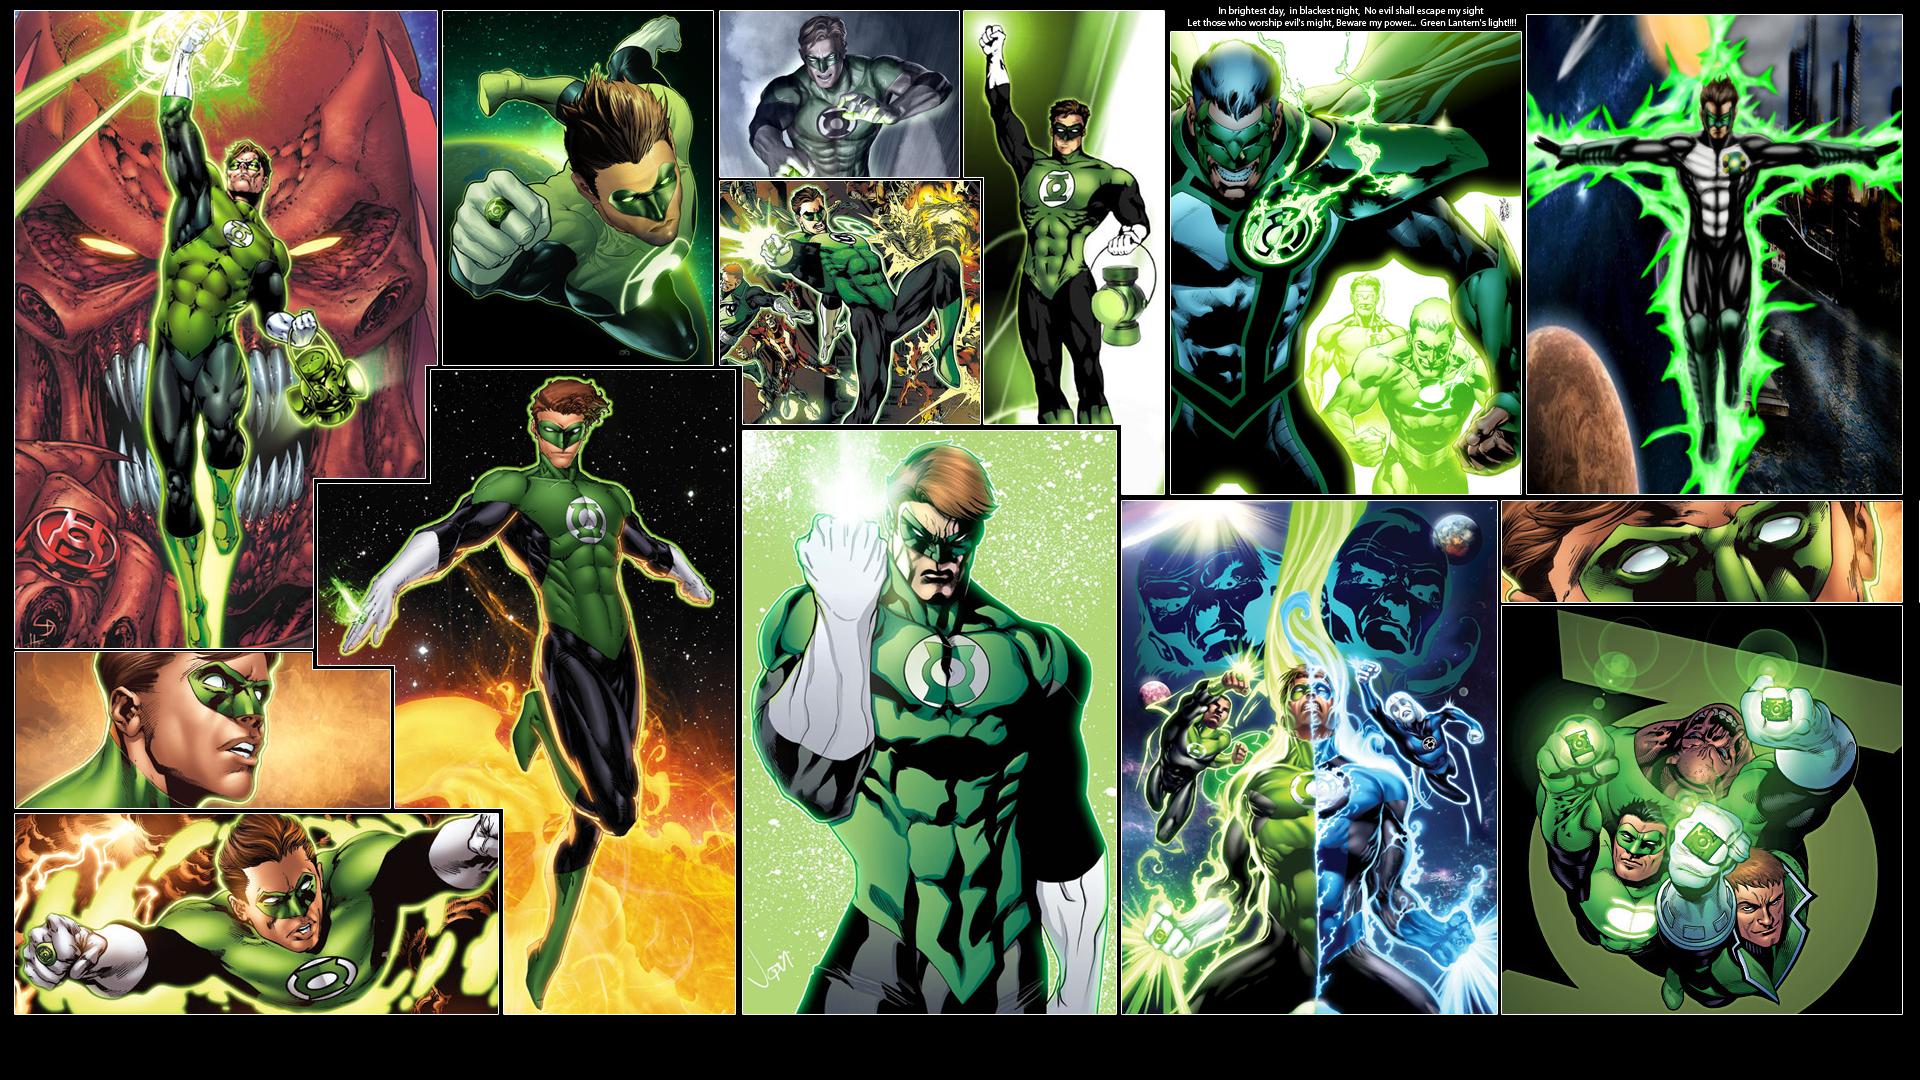 Green_Lantern_Wallpaper_by_GT_Orphan.jpg